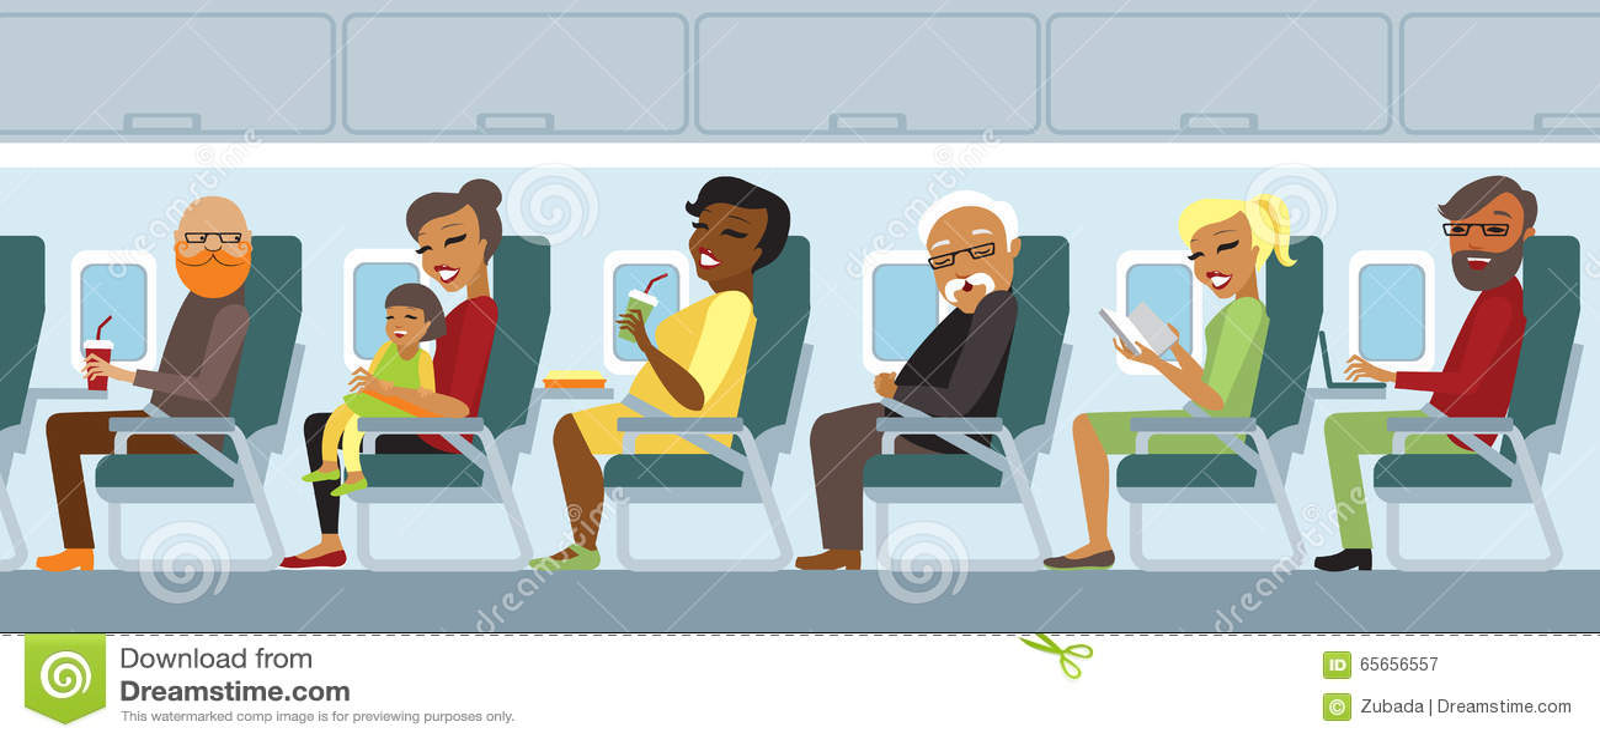 Airplane passengers on the flight